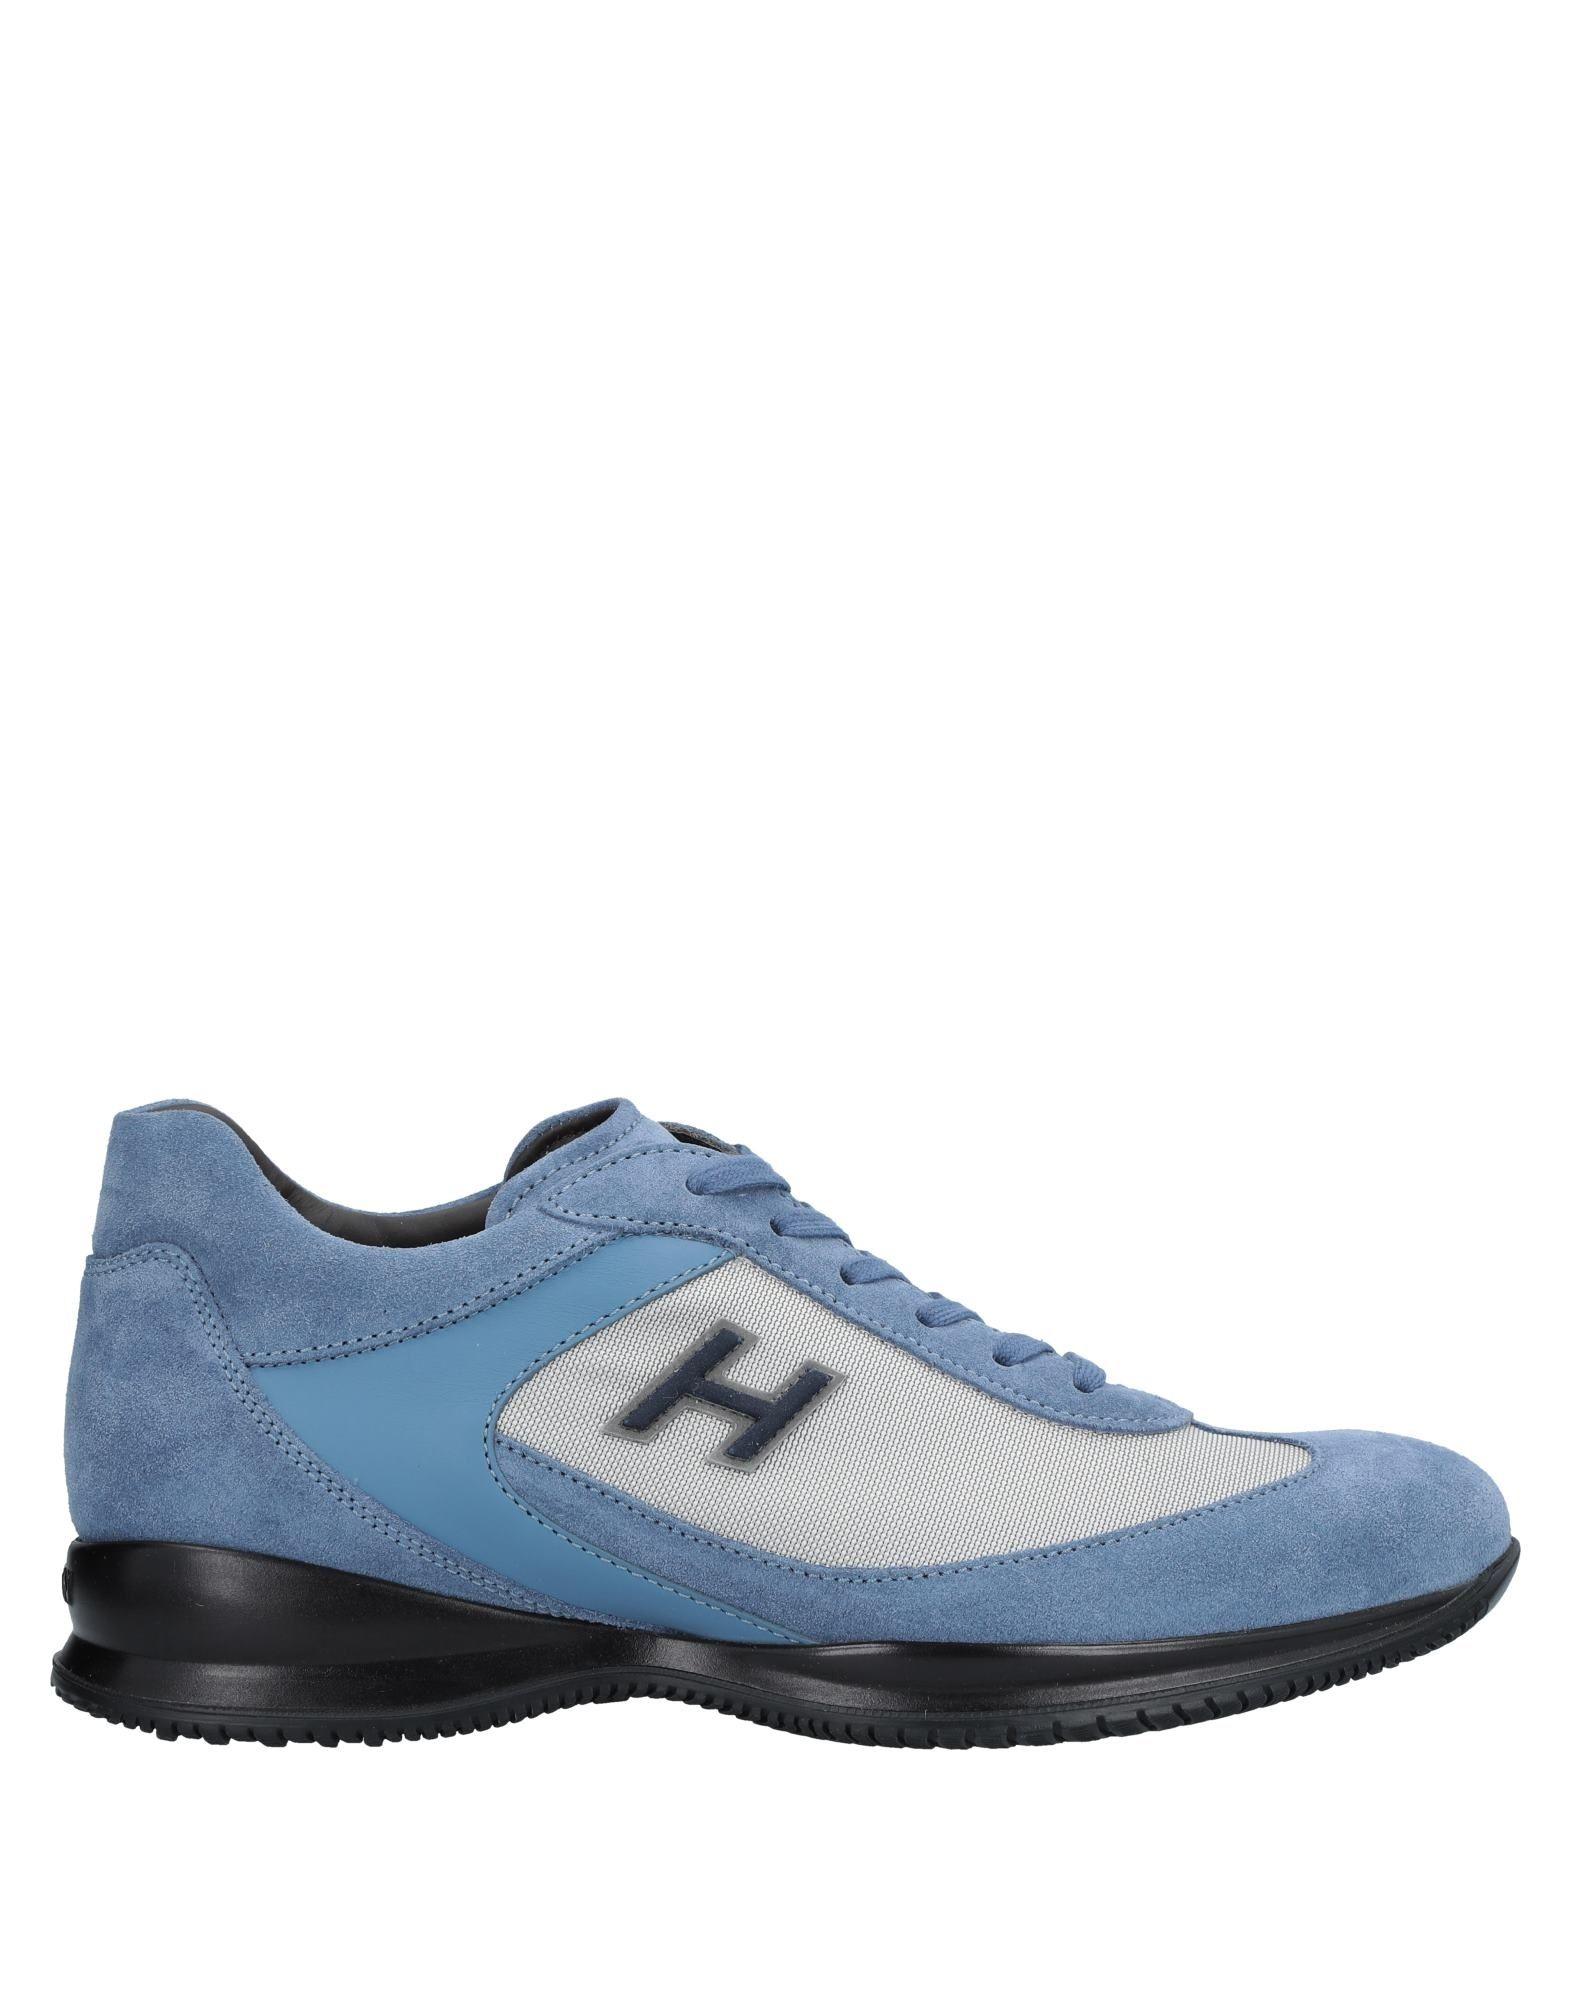 Hogan Sneakers Herren  11540267GU Gute Qualität beliebte Schuhe